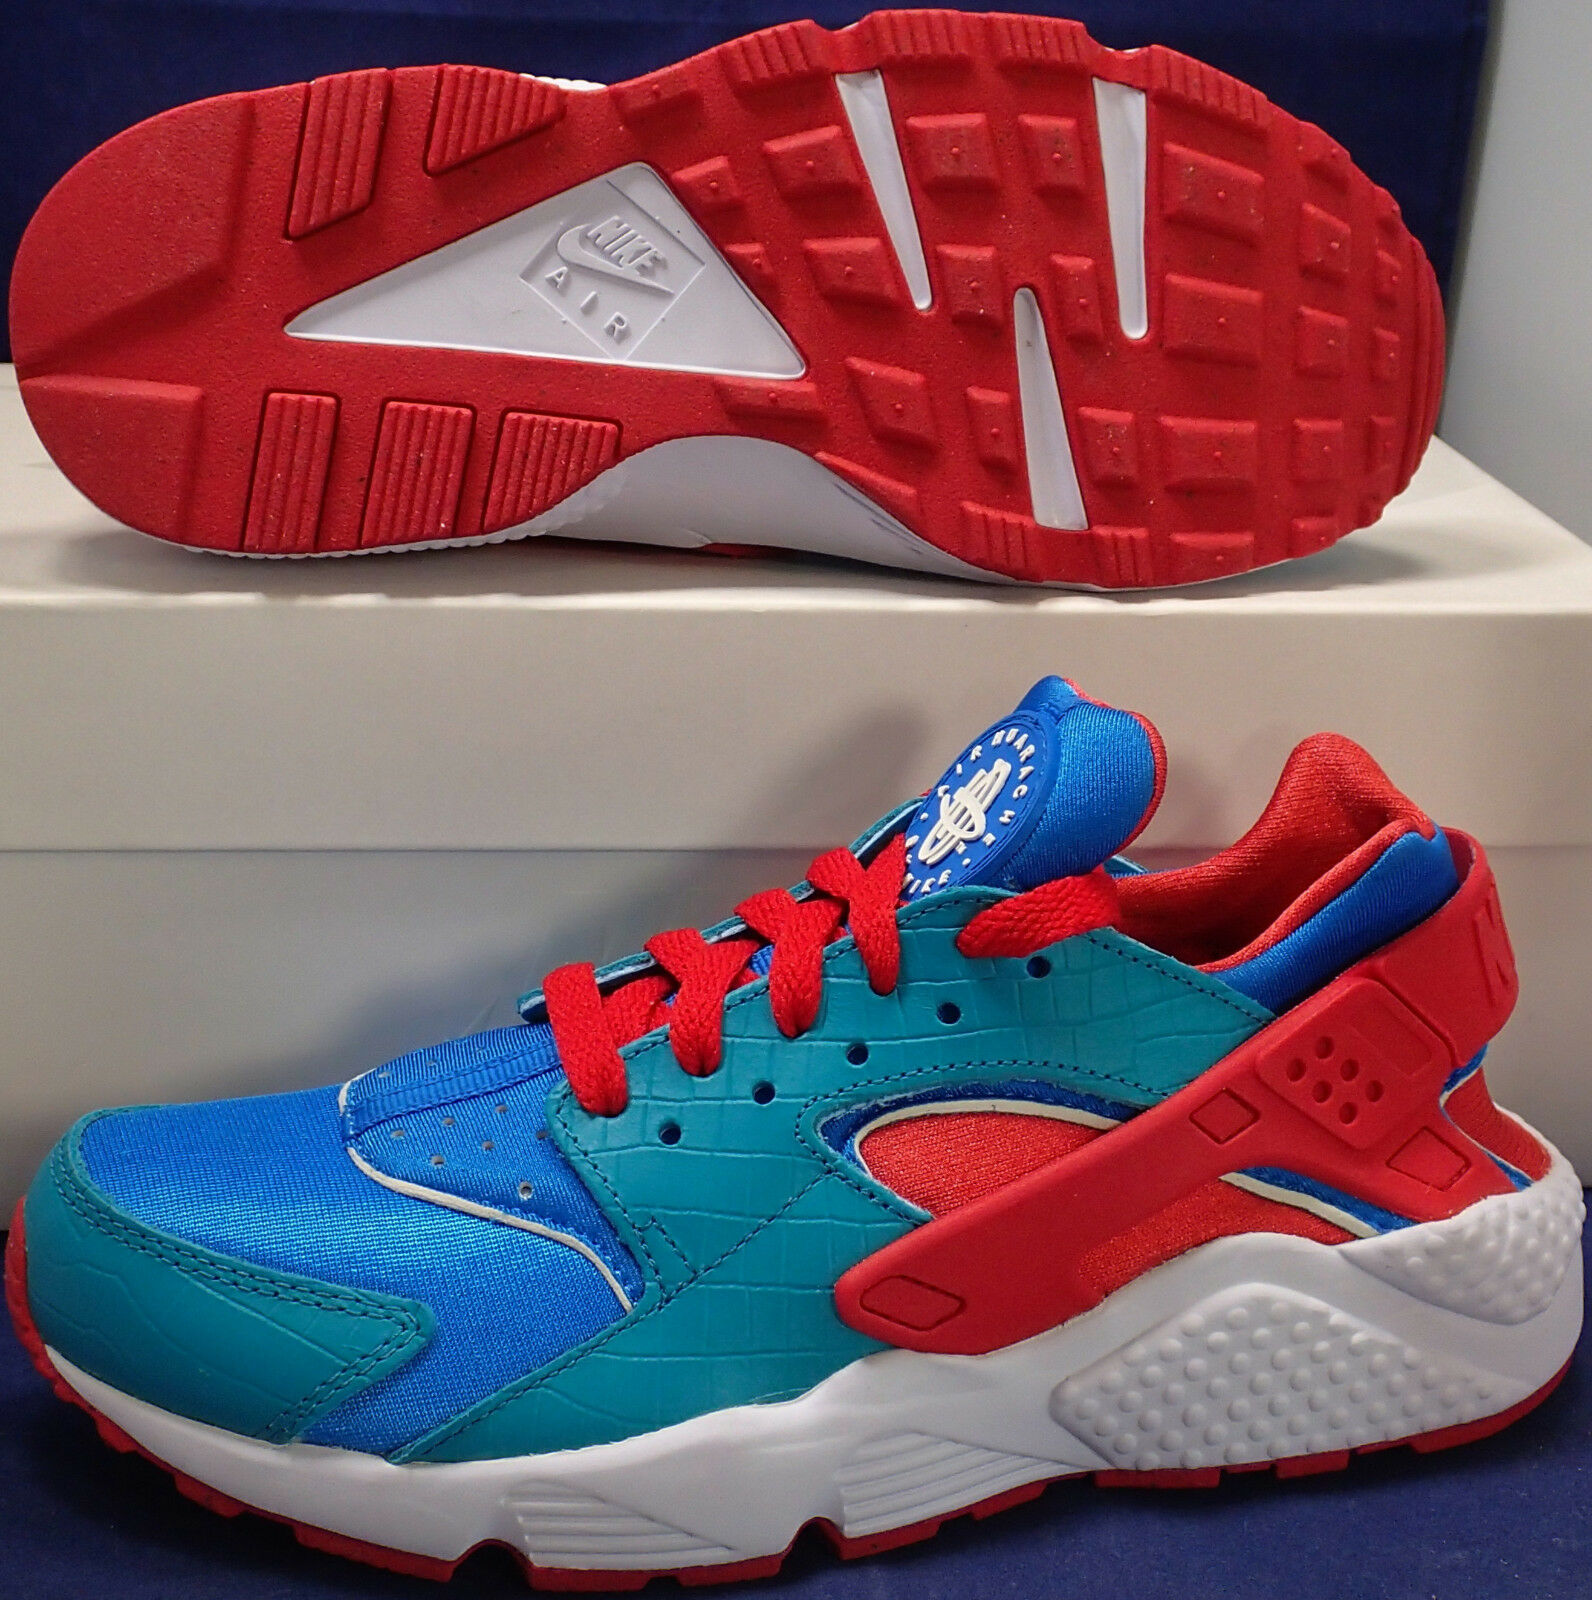 Damen Nike Luft Huarache Run Identifikation Kroko Türkis Sz Rot Blau Sz Türkis 7.5 607773